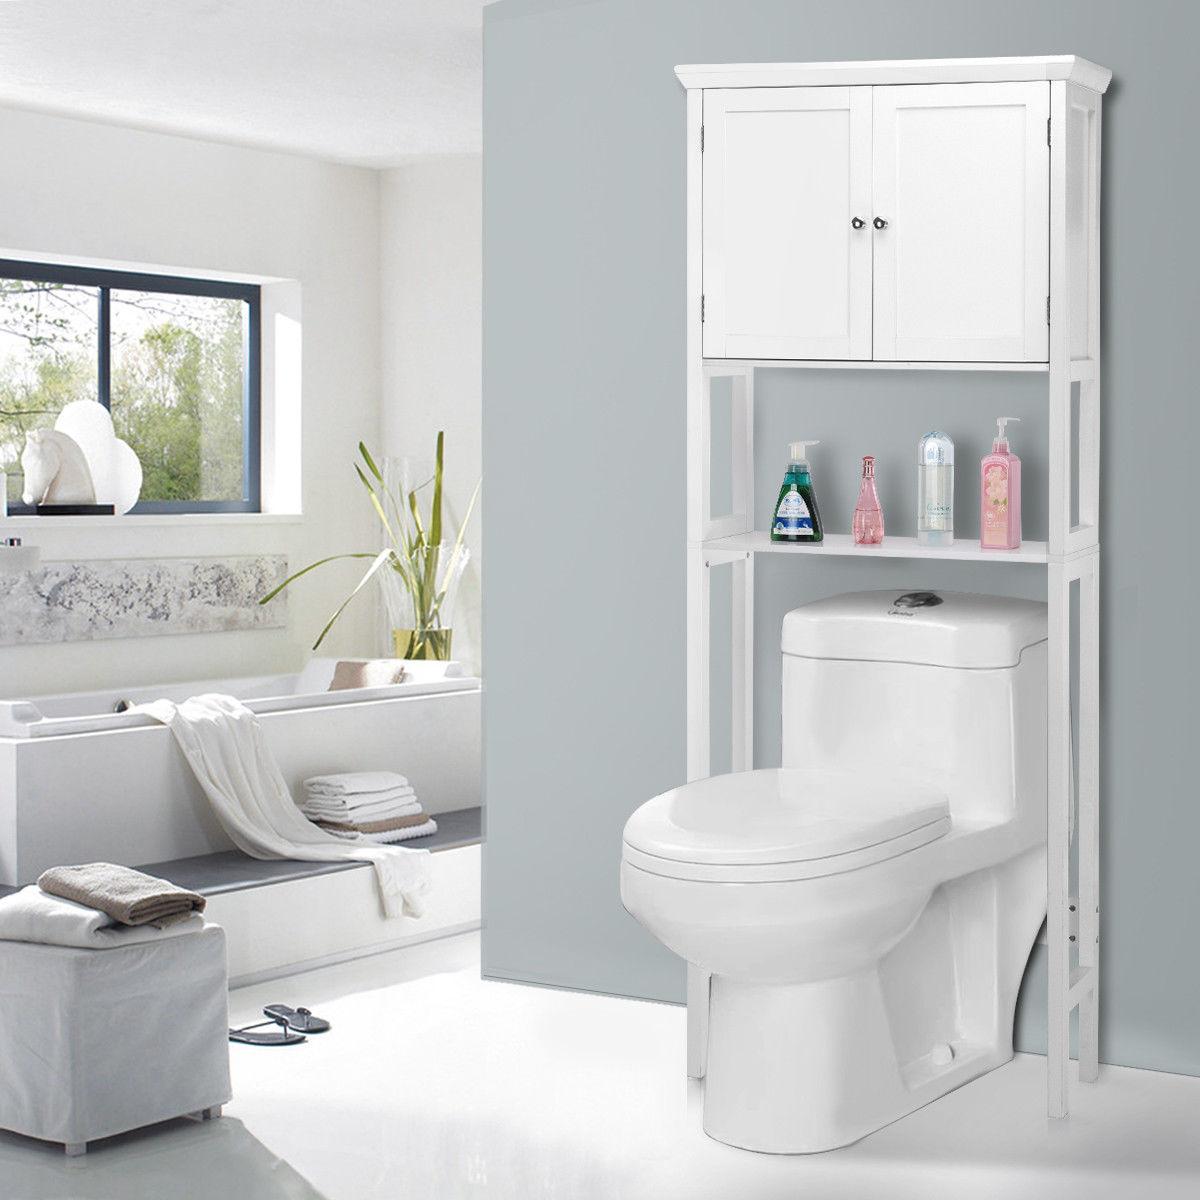 Giantex Toilet Storage Space Saver Towel Rack Shelf Modern Bathroom ...